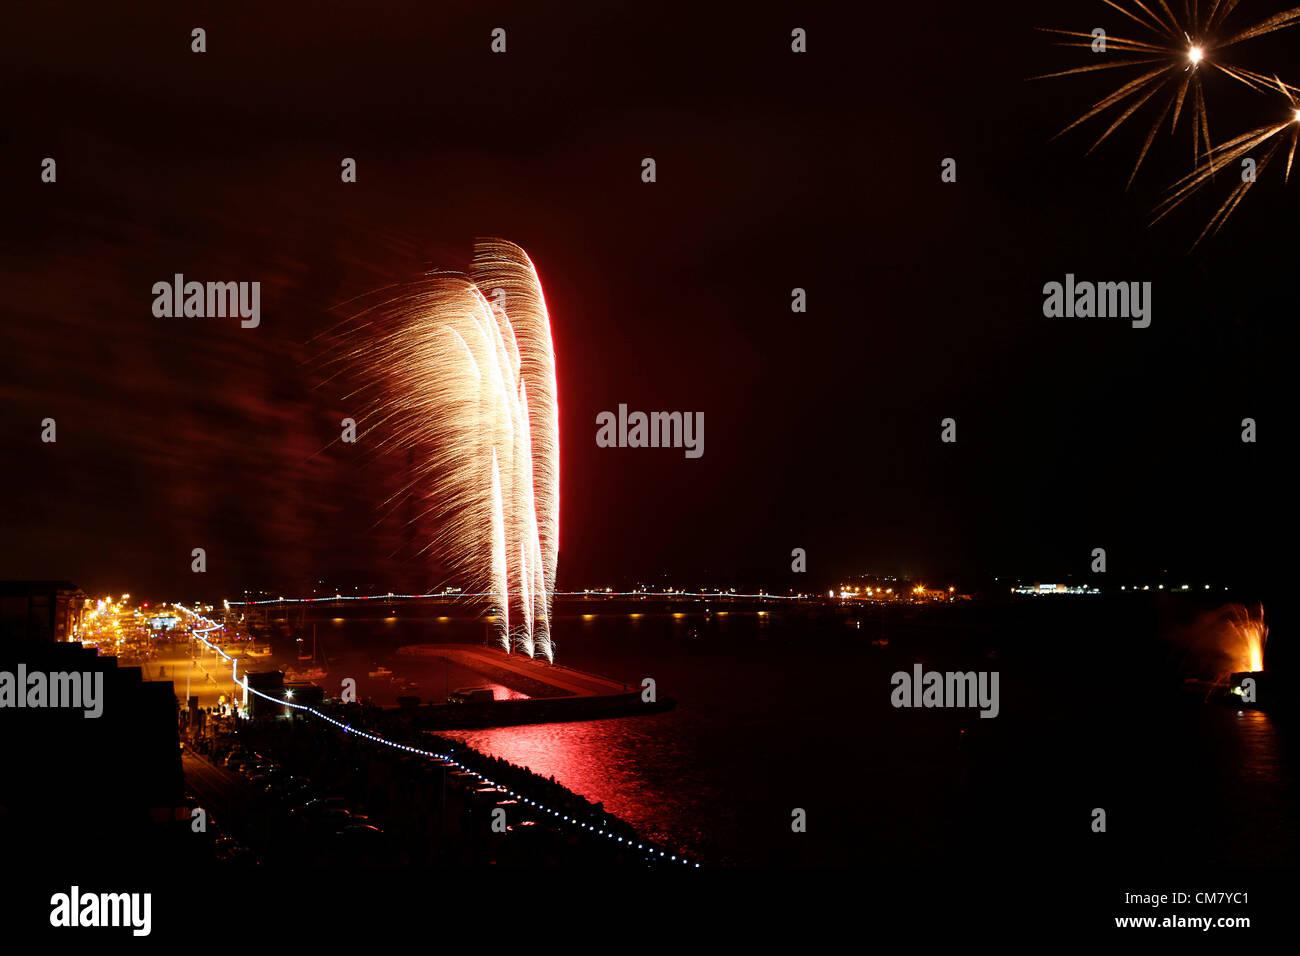 Wexford opera festival fireworks 2012